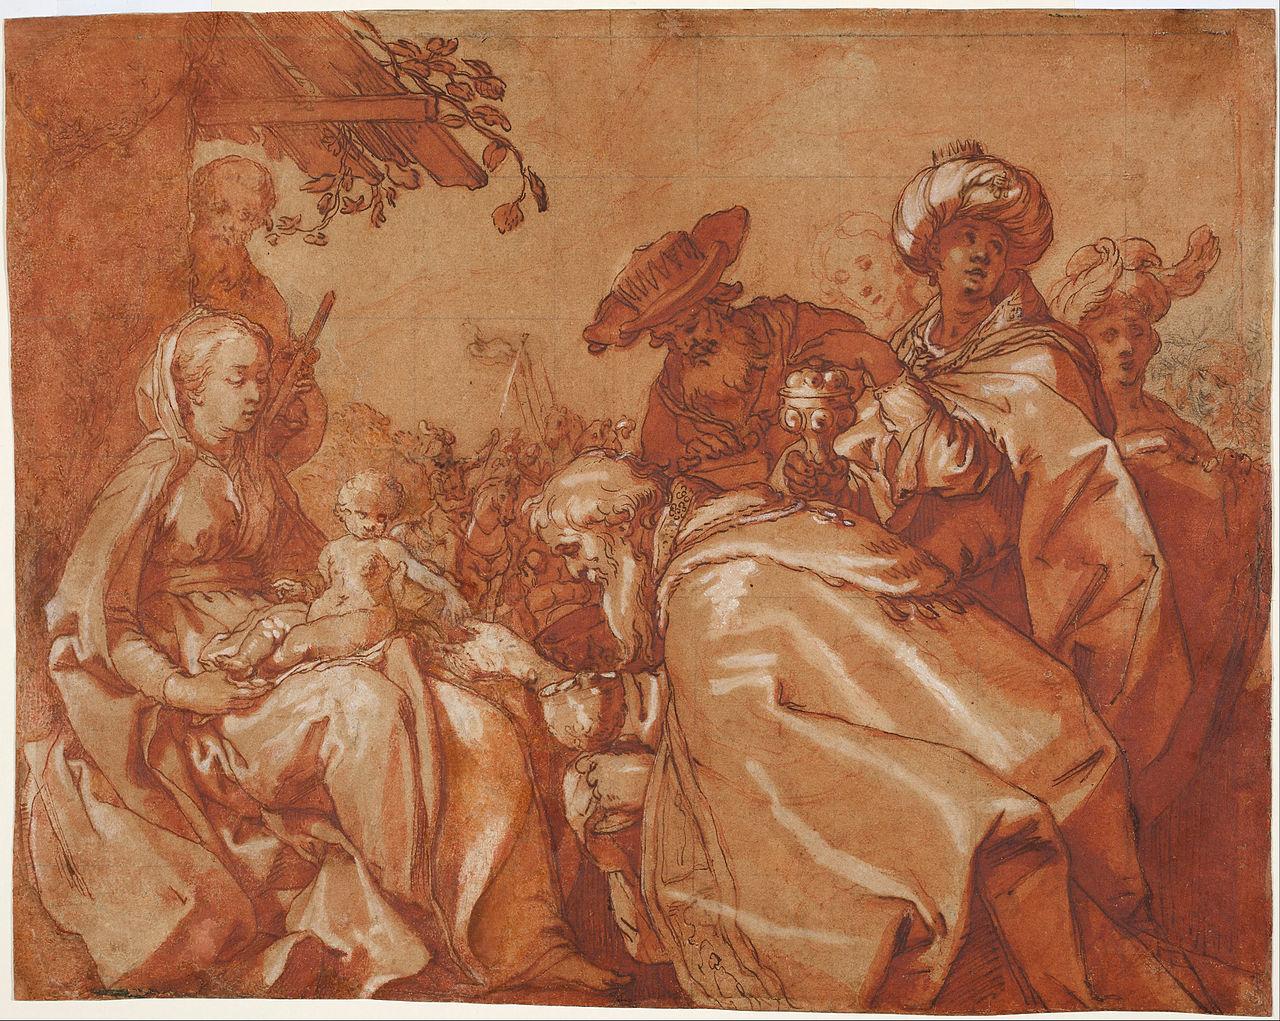 1280px-Abraham_Bloemaert_-_The_adoration_of_the_Magi_-_Google_Art_Project_(28709031)